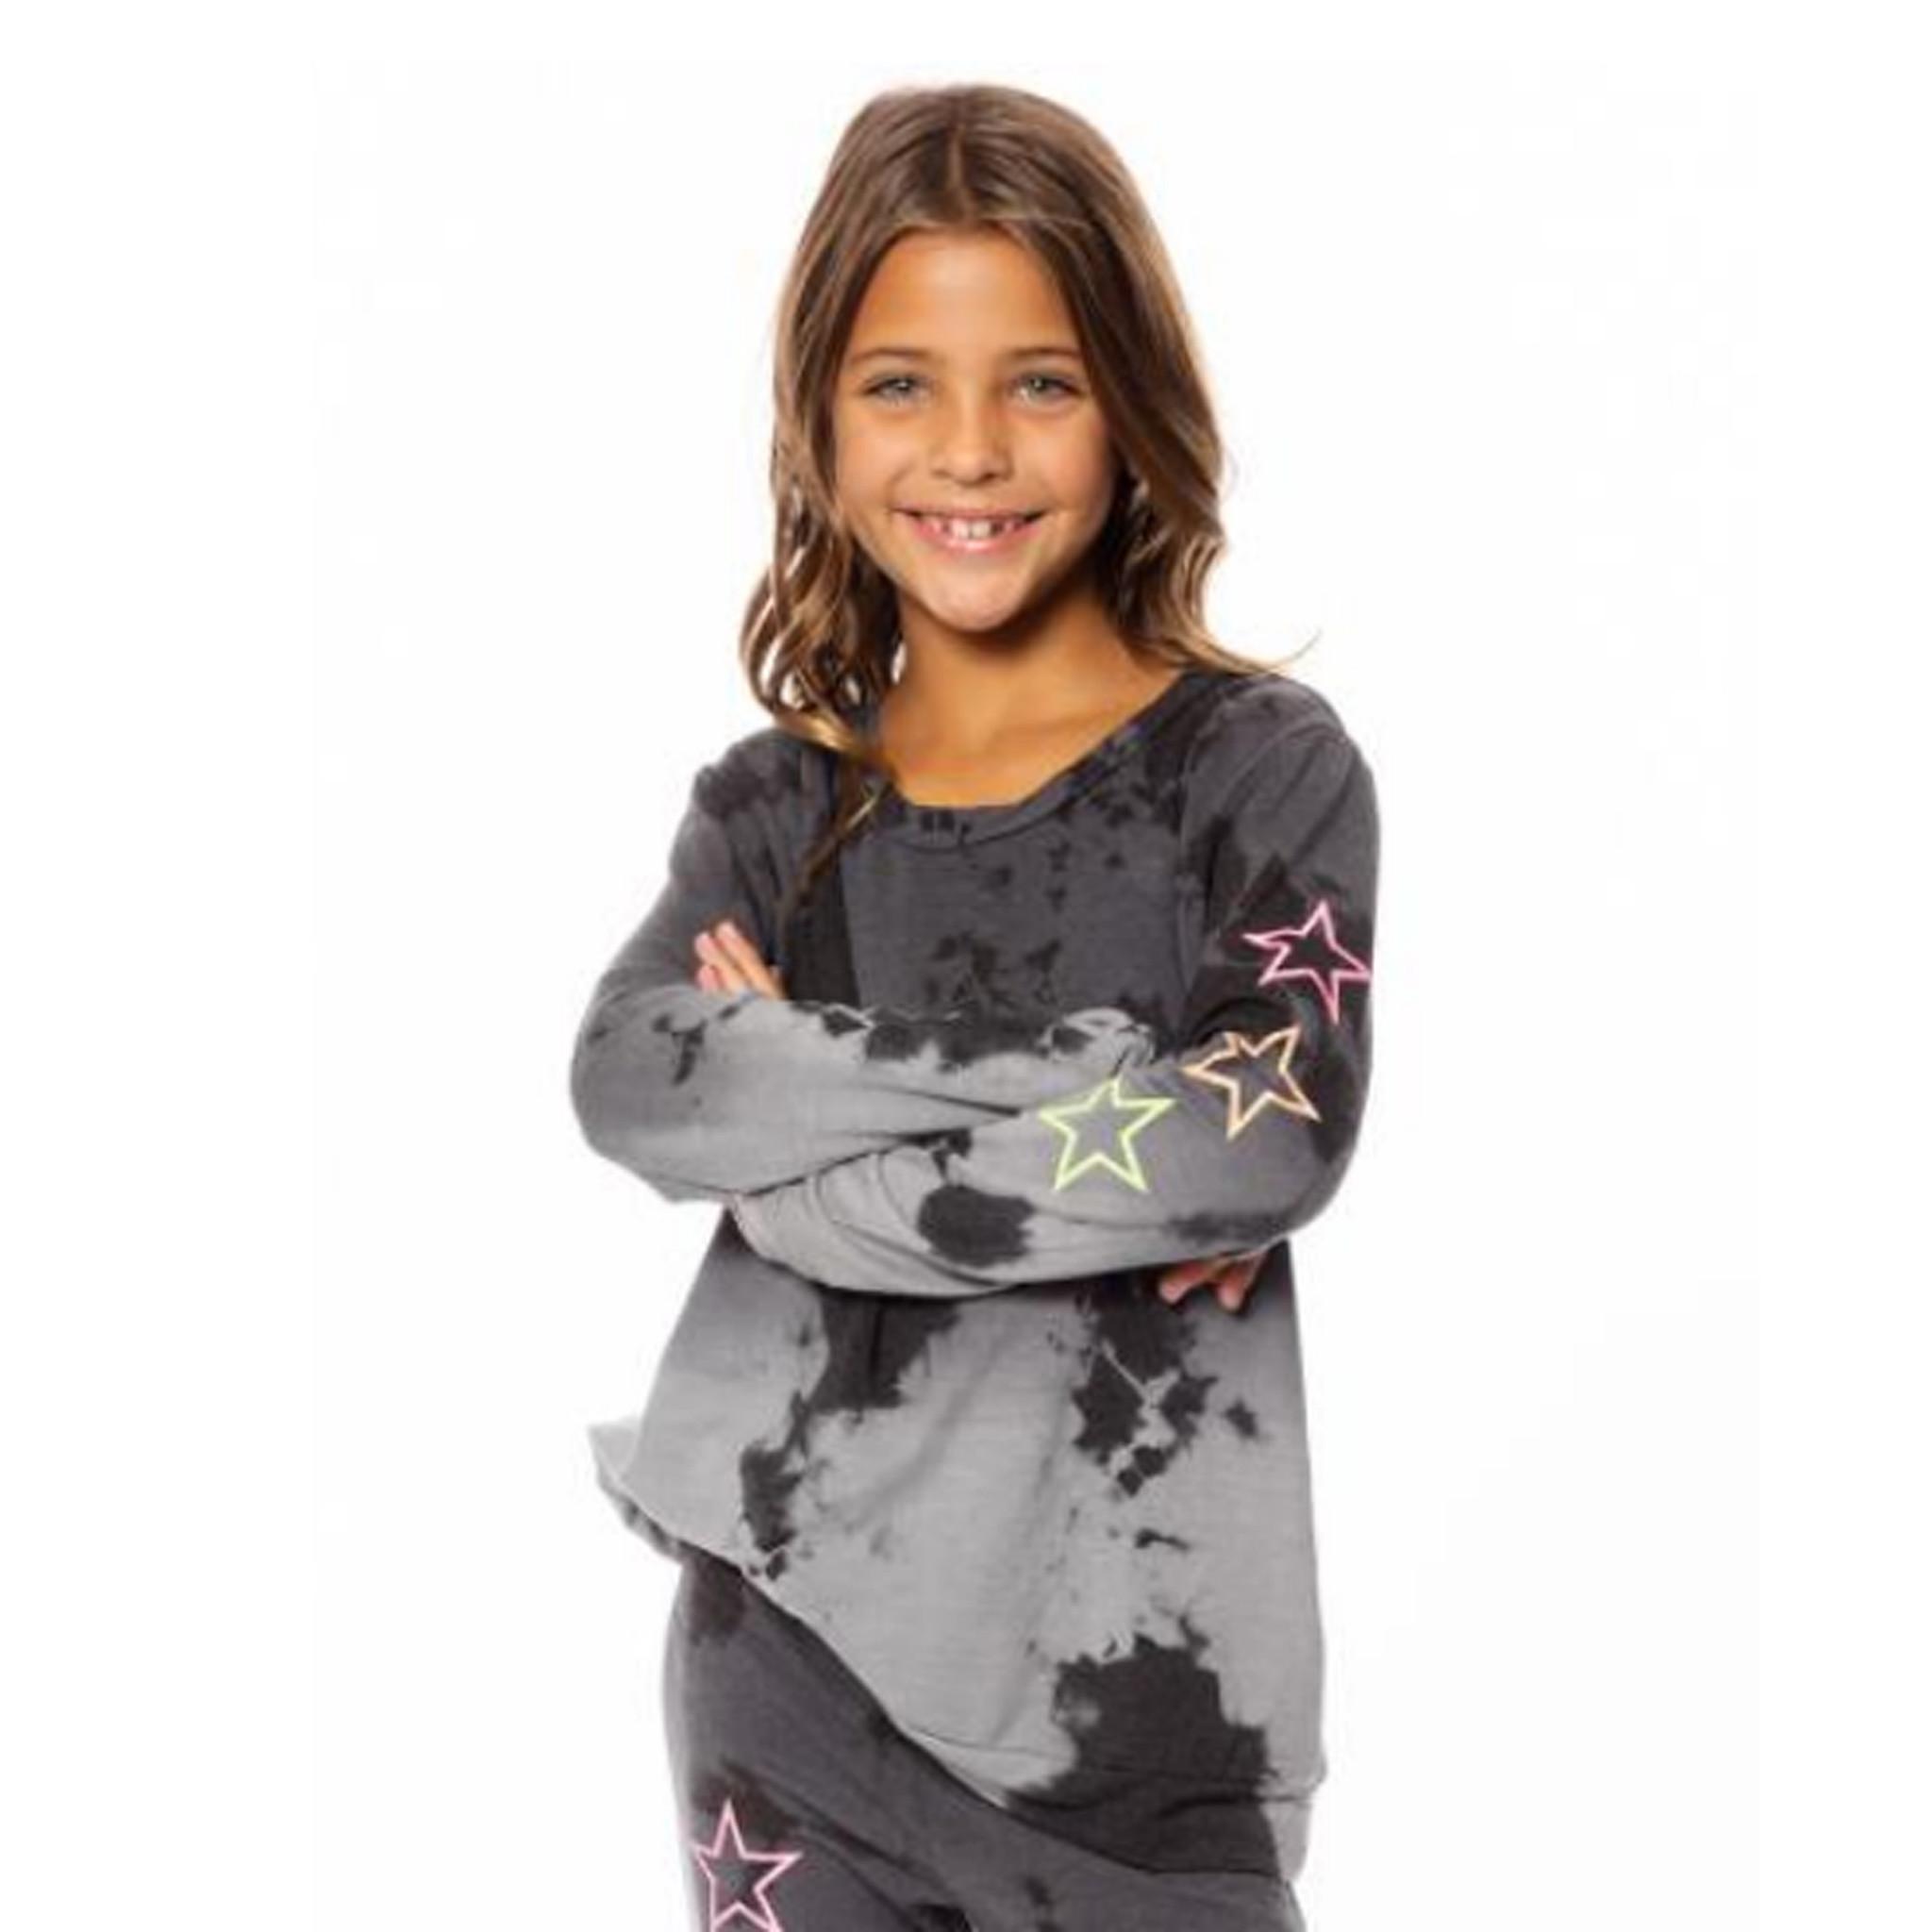 Malibu Sugar Ombre Tie Dye Sweatshirt with Neon Stars